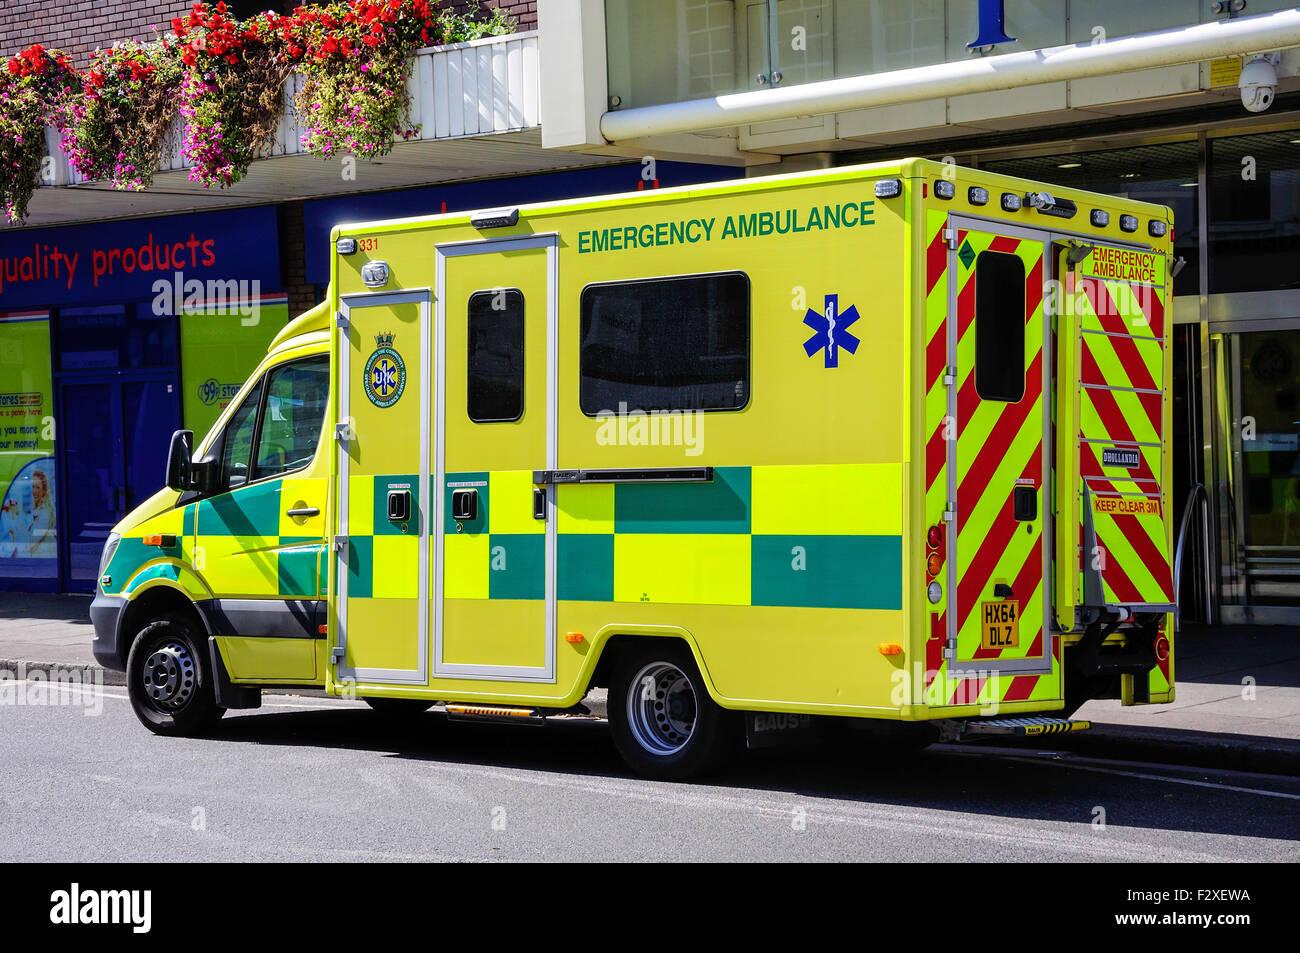 Emergency Ambulance on call, Lowfield Street, Dartford, Kent, England, United Kingdom - Stock Image